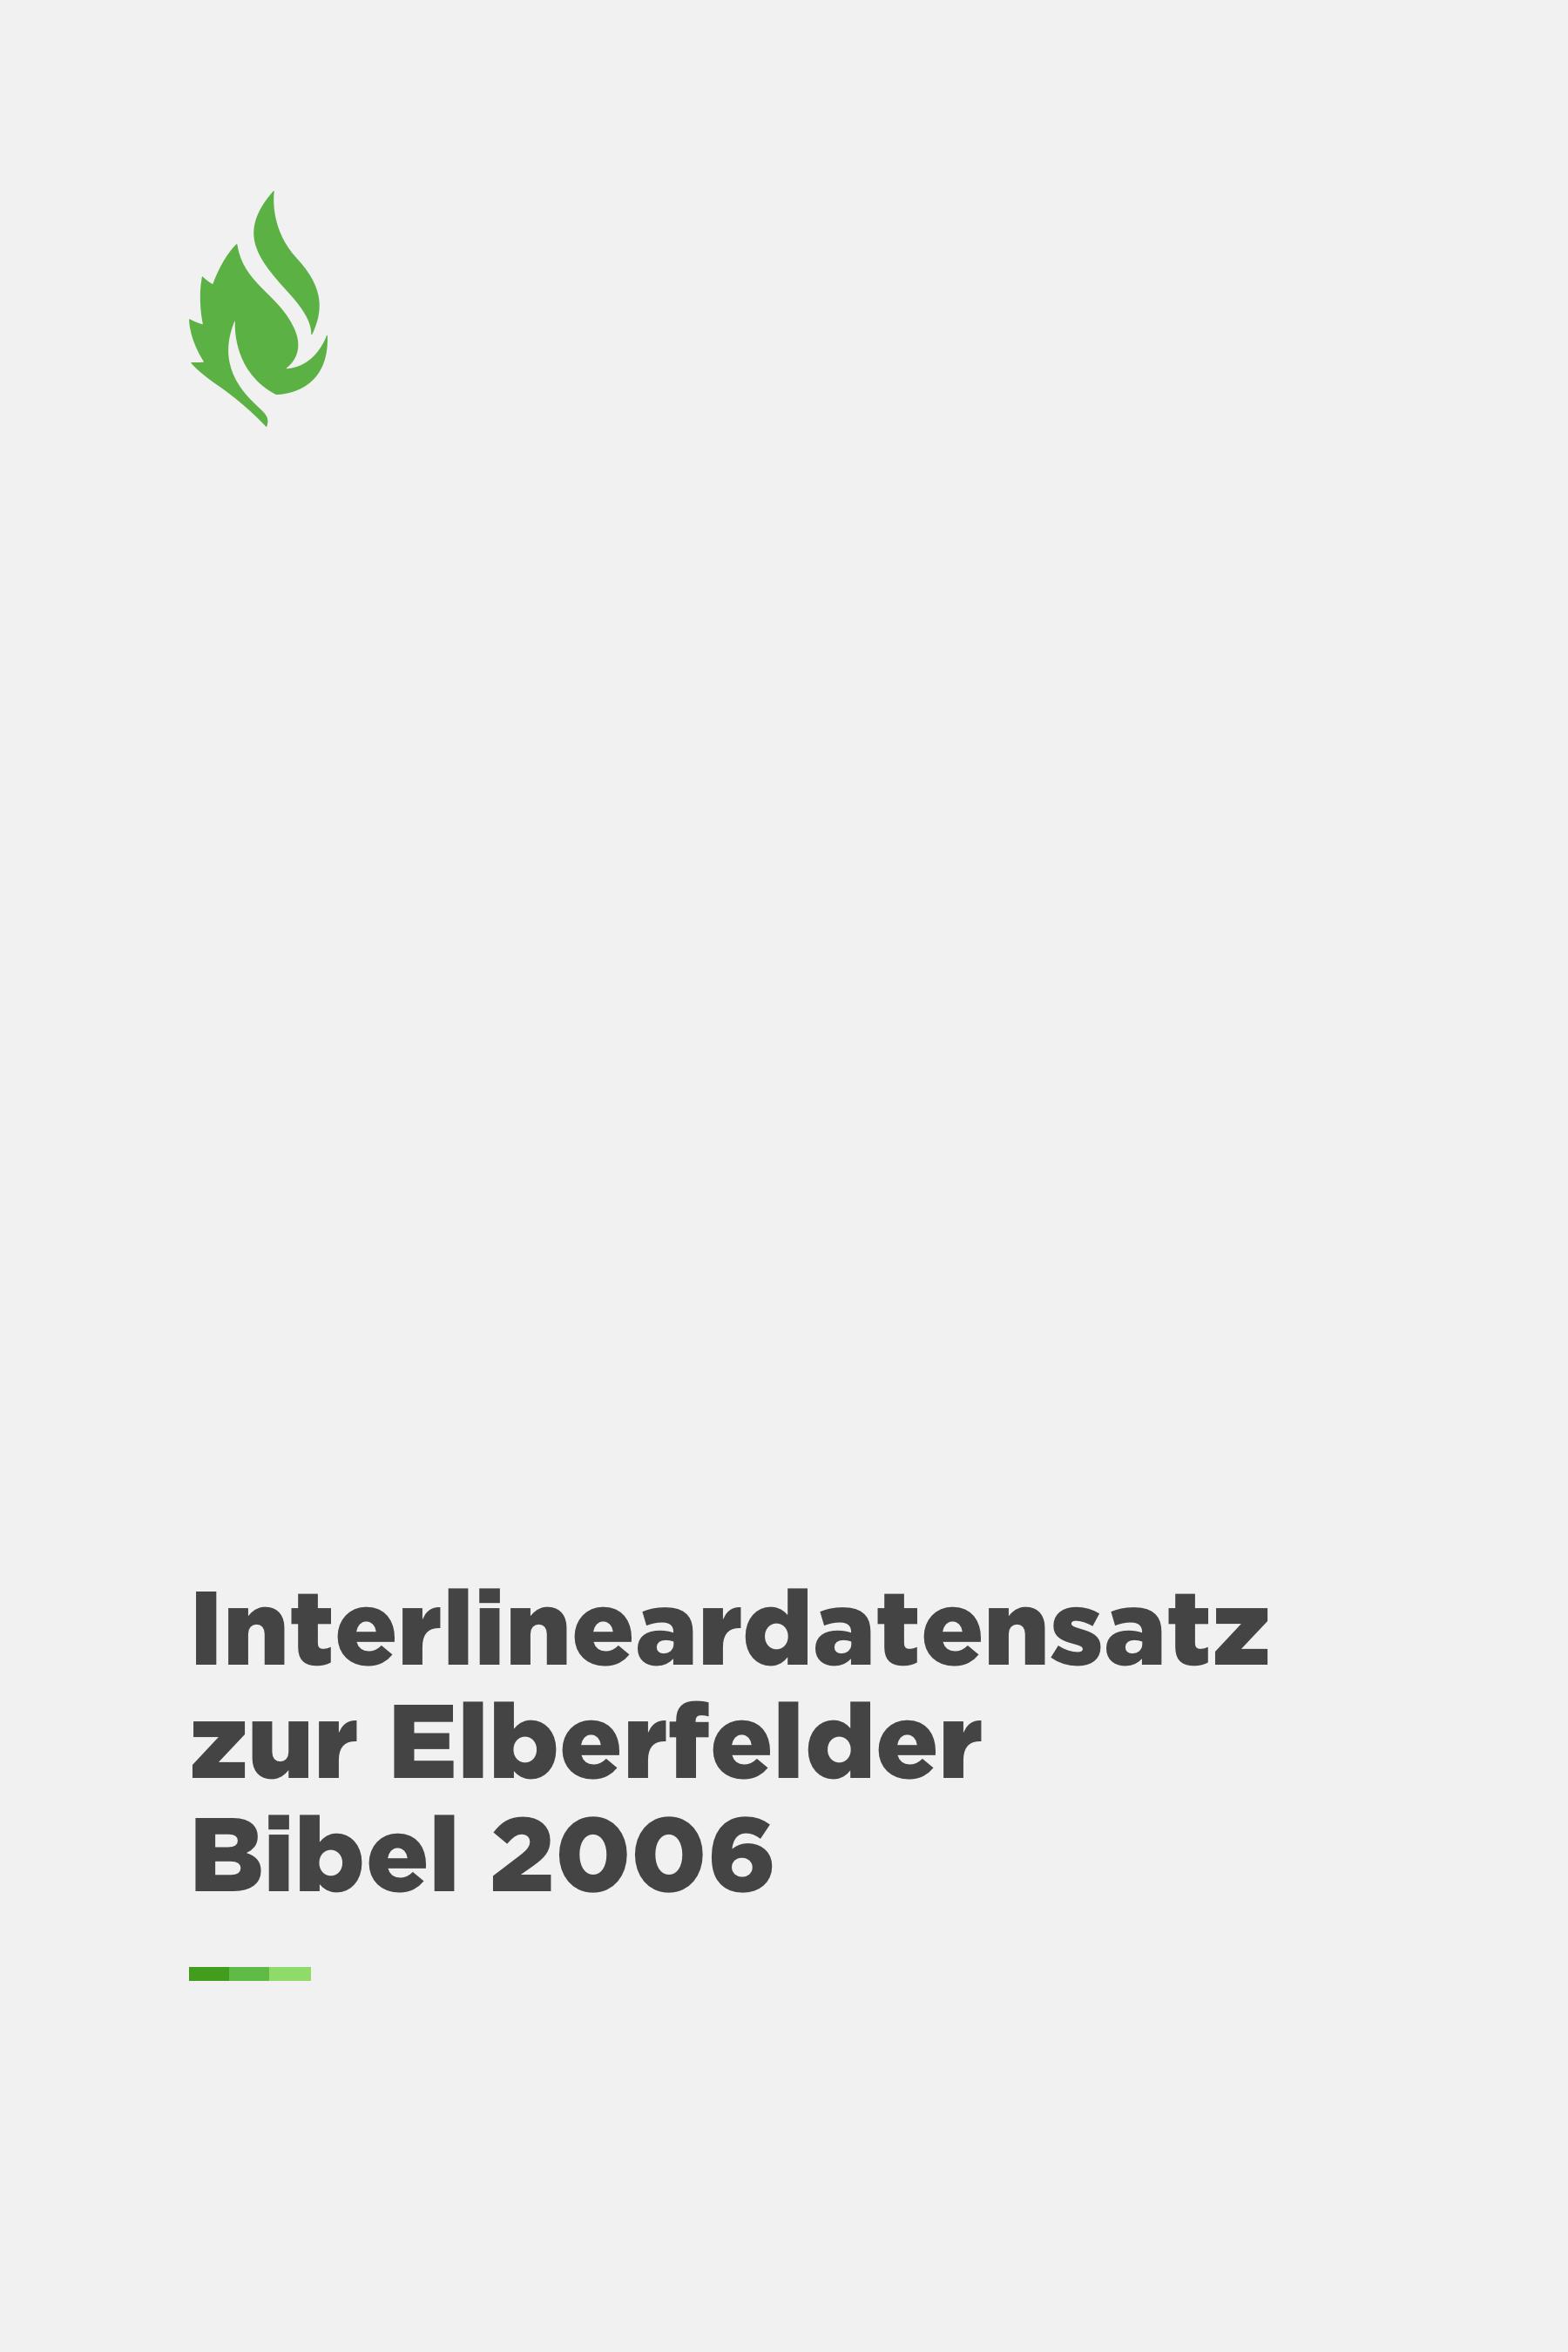 Interlineardatensatz zur Elberfelder Bibel 2006